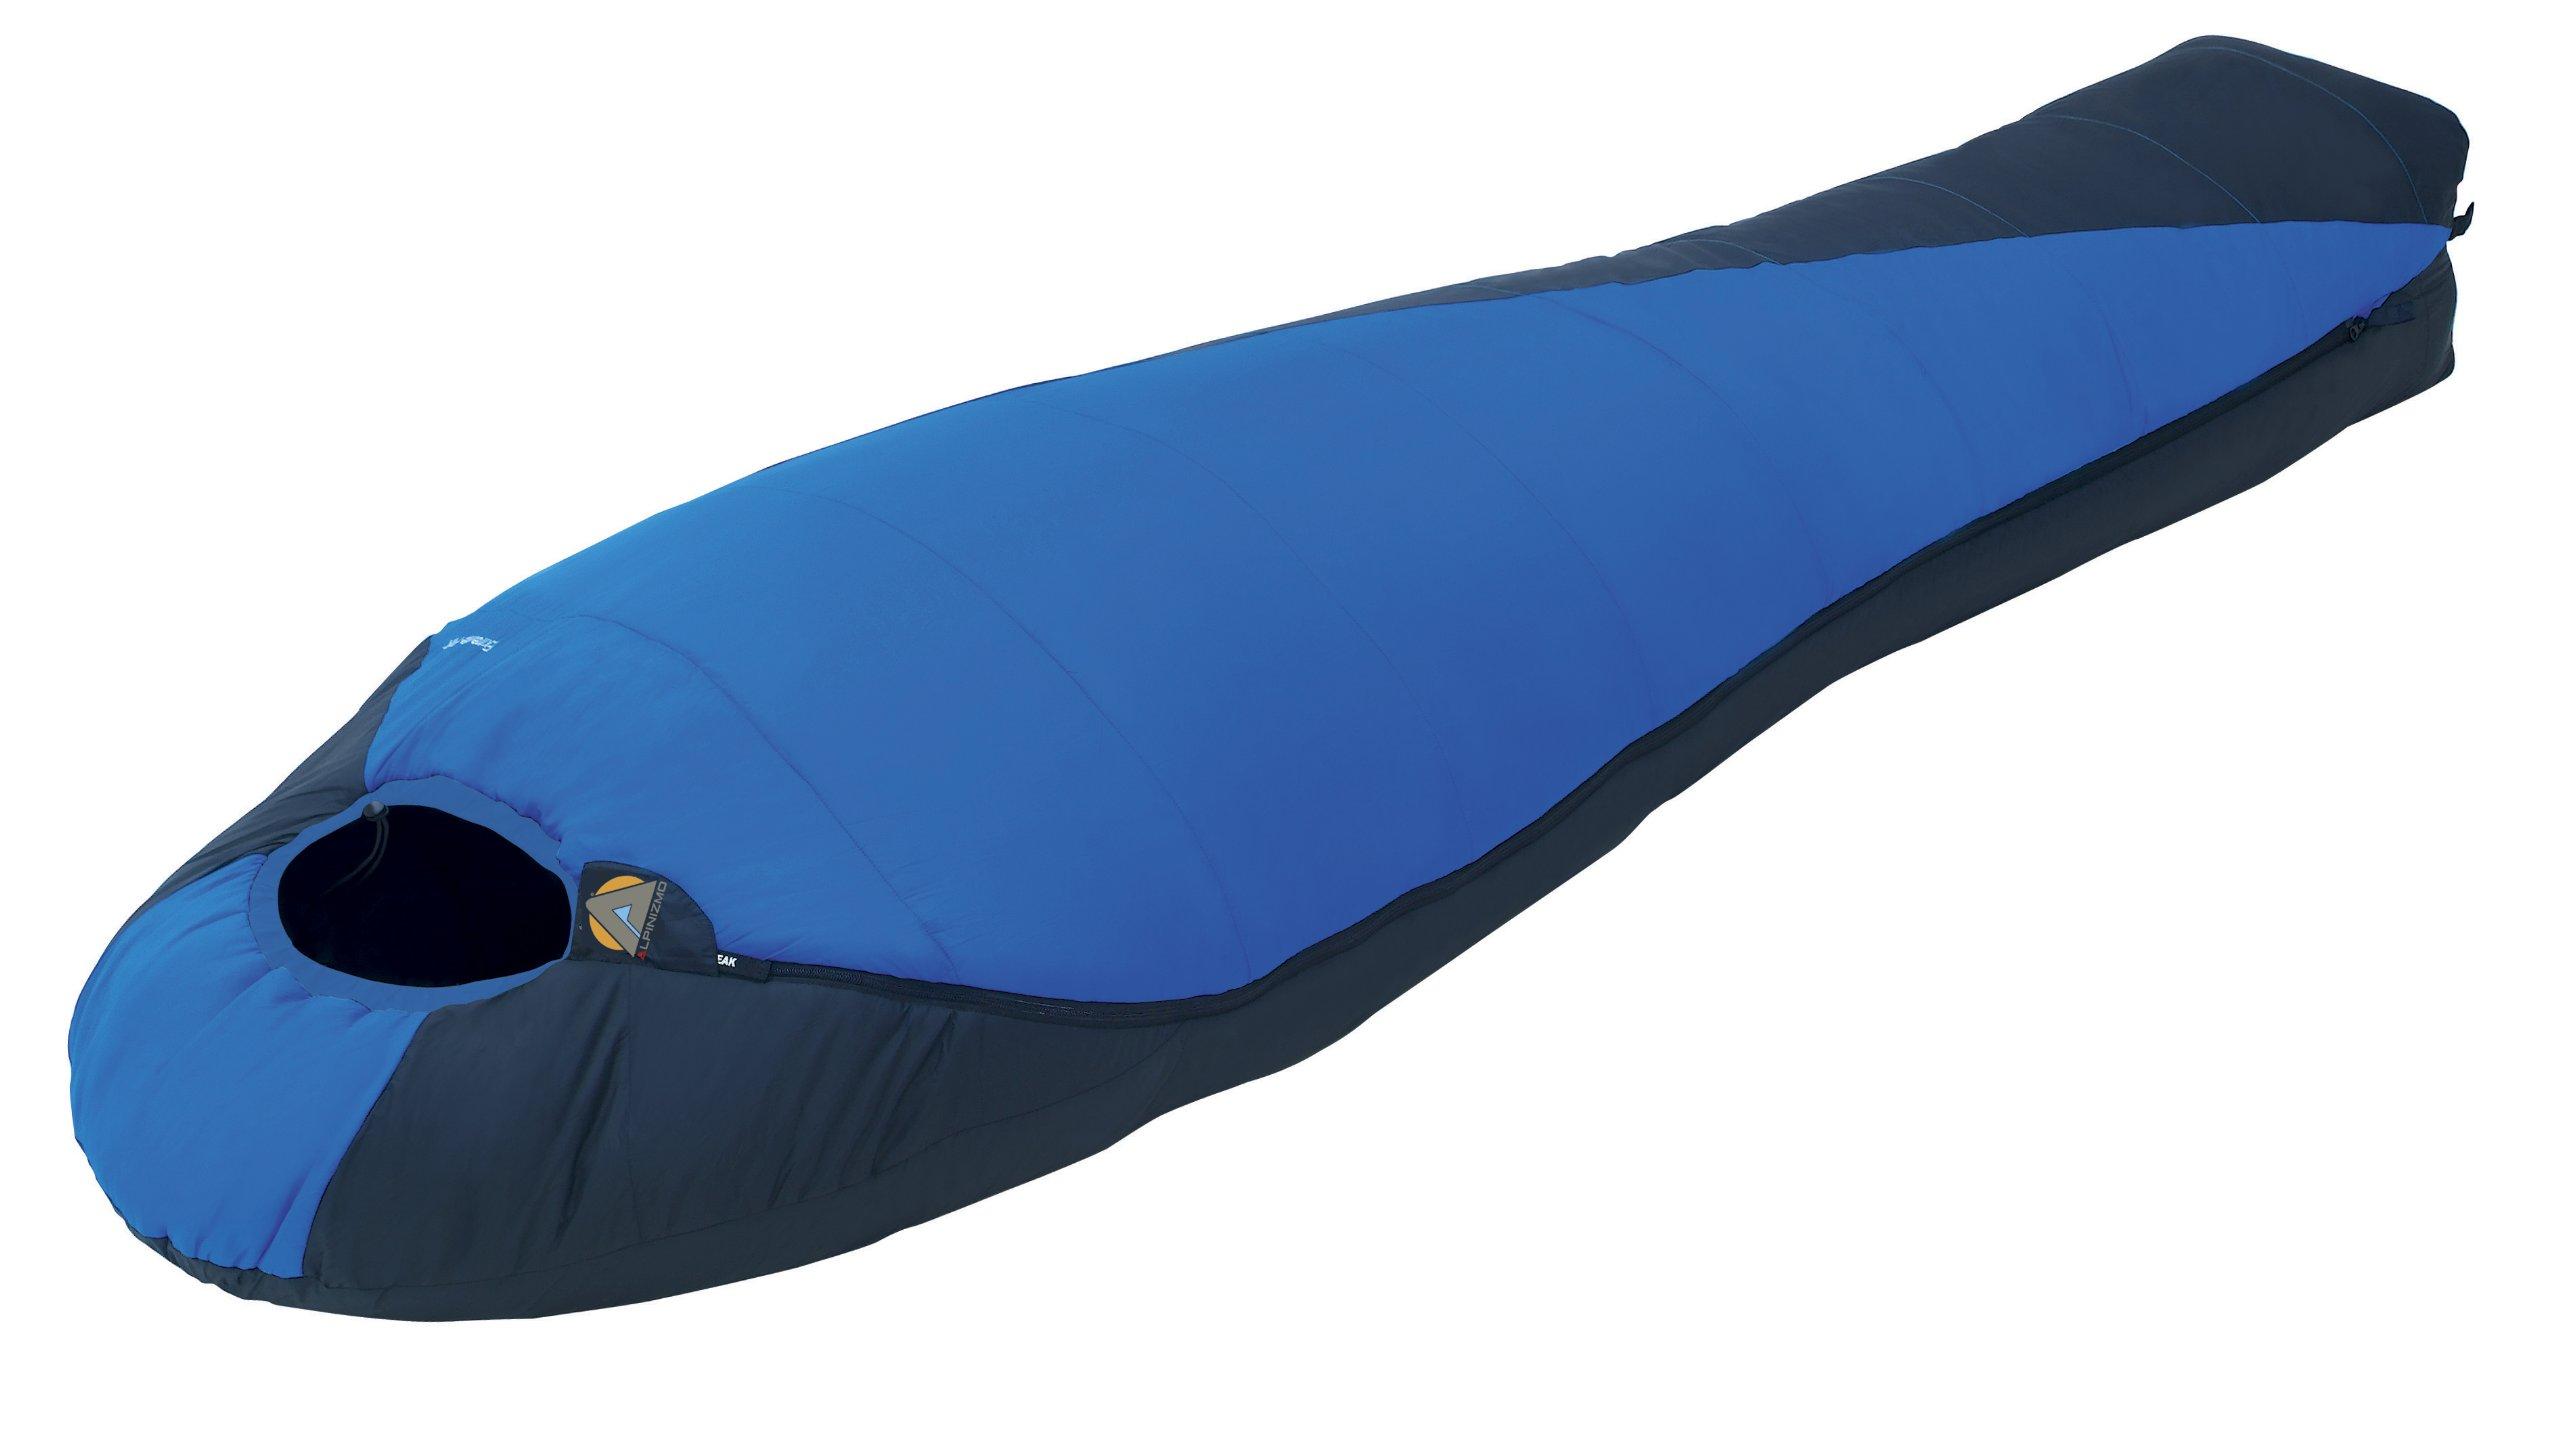 High Peak USA Alpinizmo Extreme Sleeping Bag, Blue, Regular by Alpinizmo